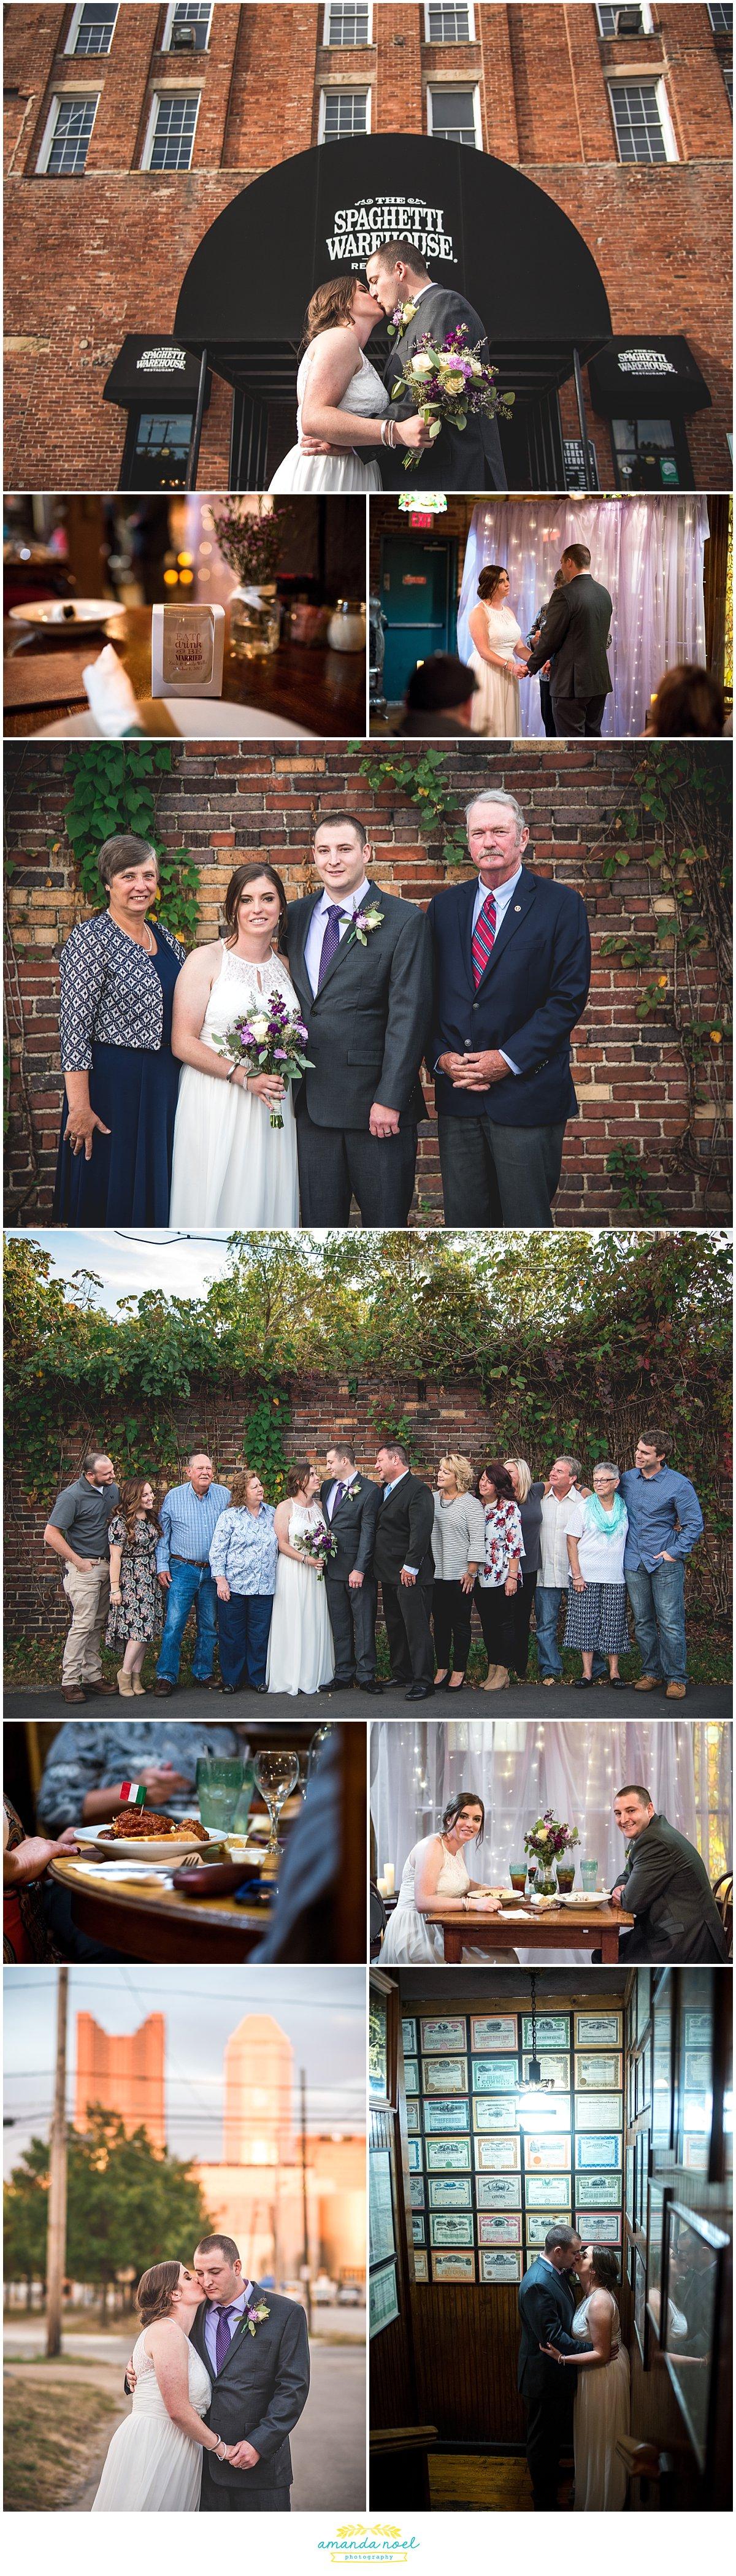 Columbus Ohio Wedding Photographer | The Spaghetti Warehouse